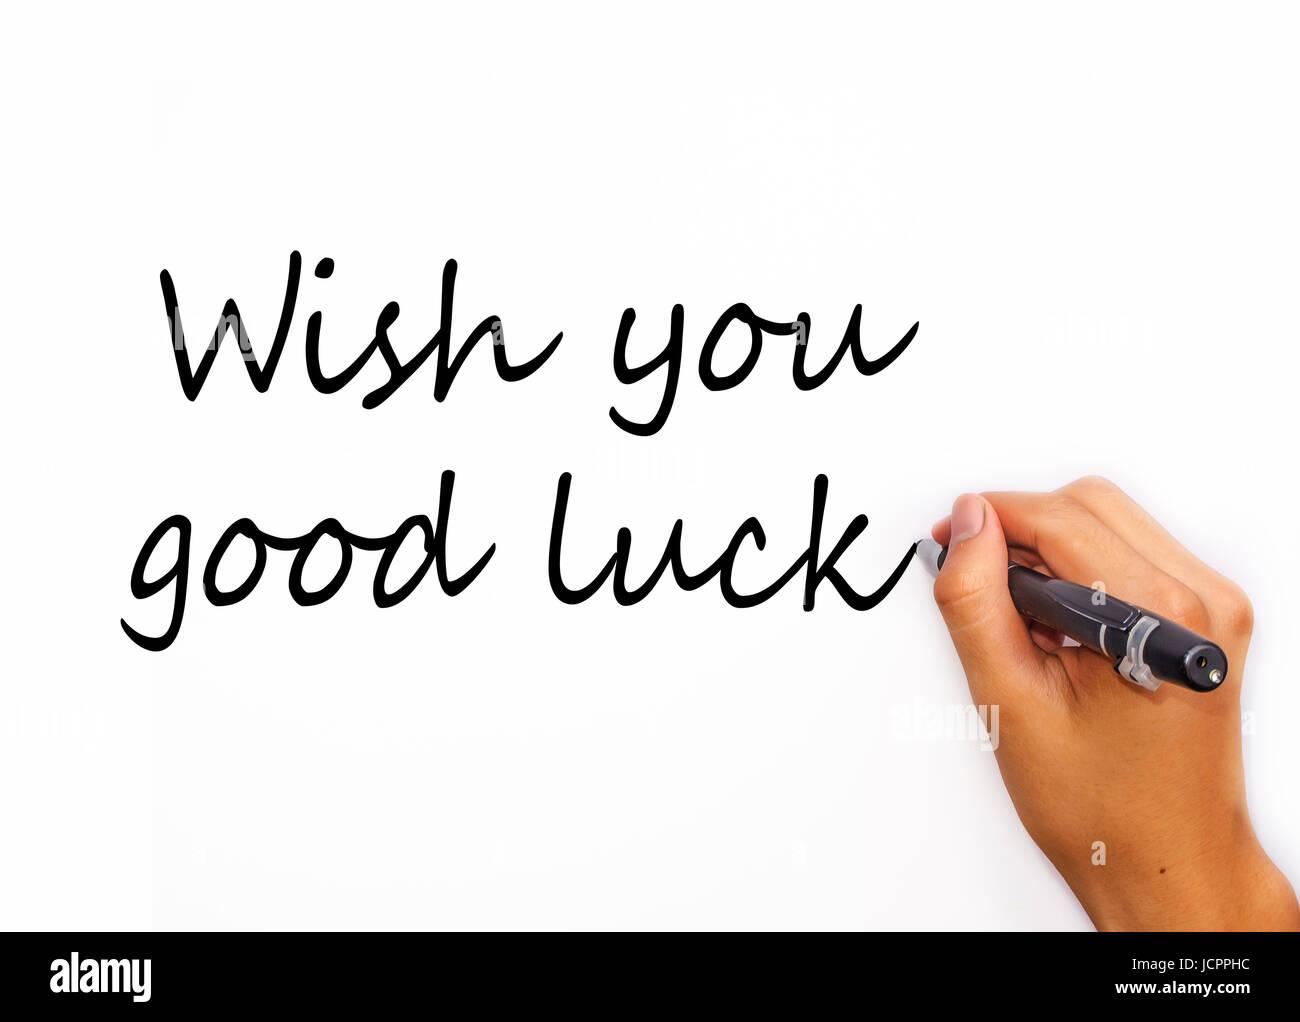 We Wish You Good Luck